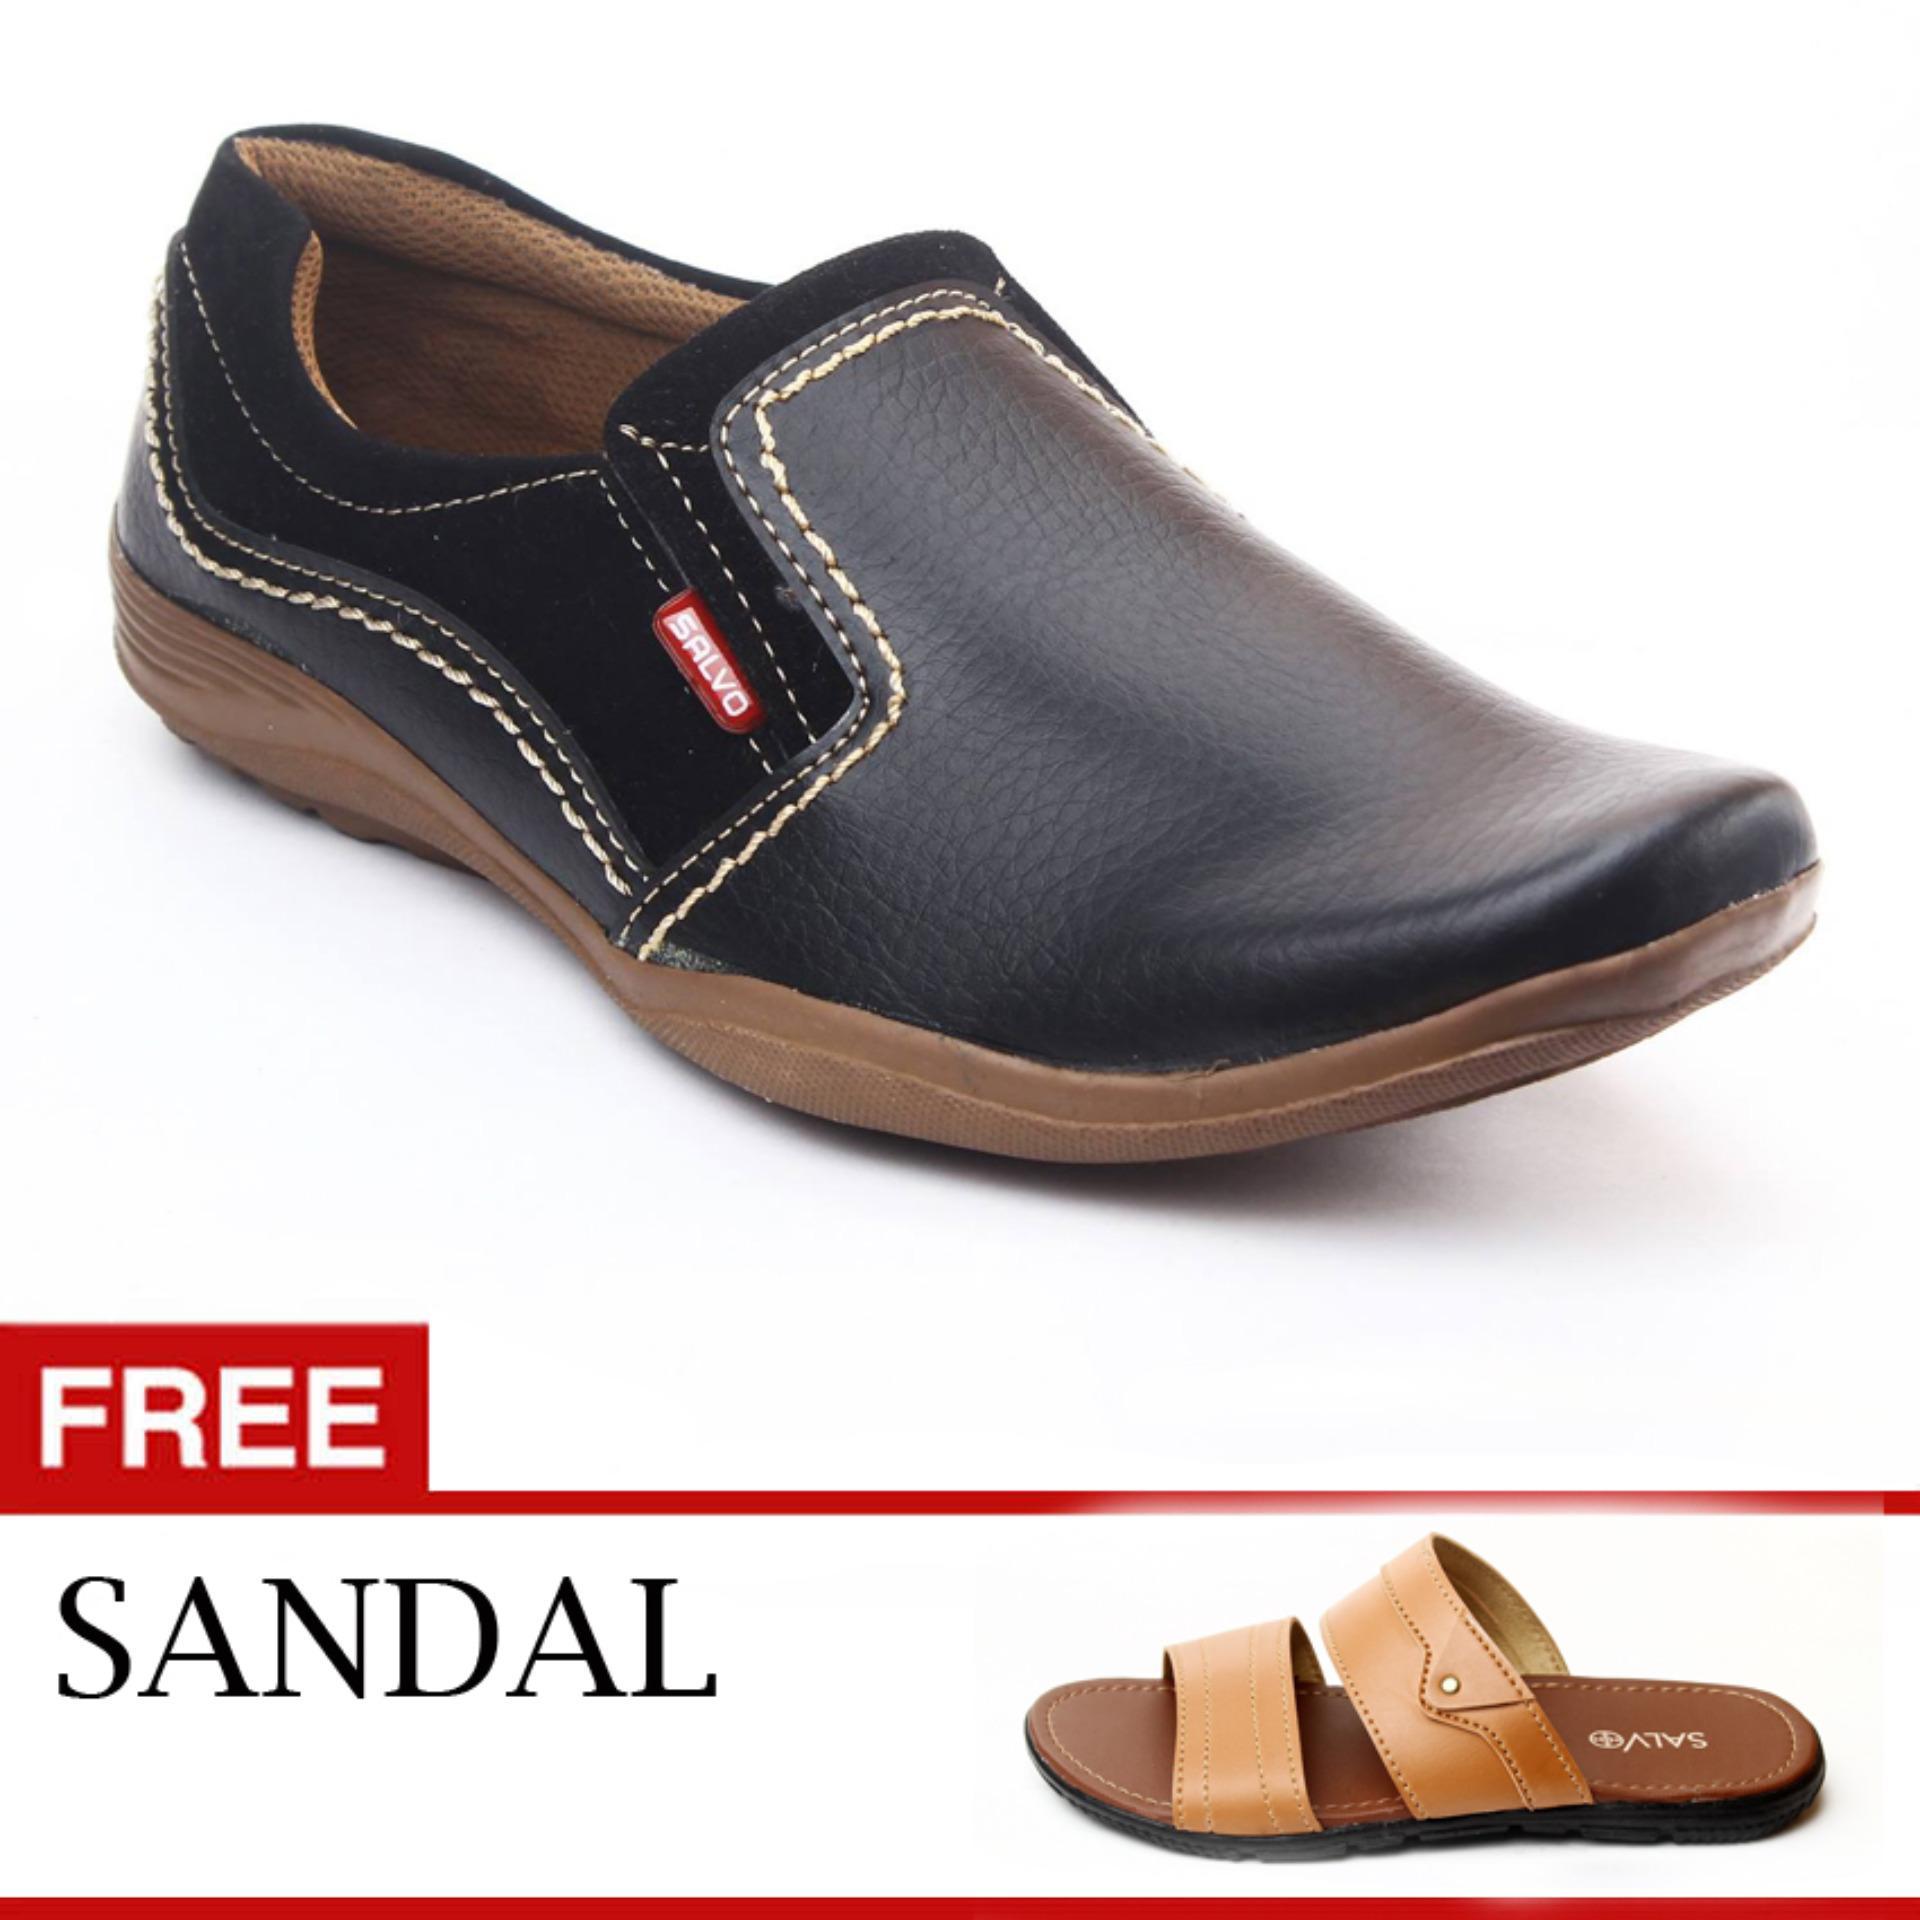 ... Salvo sepatu loafer BK01 hitam free sandal L01 tan ...